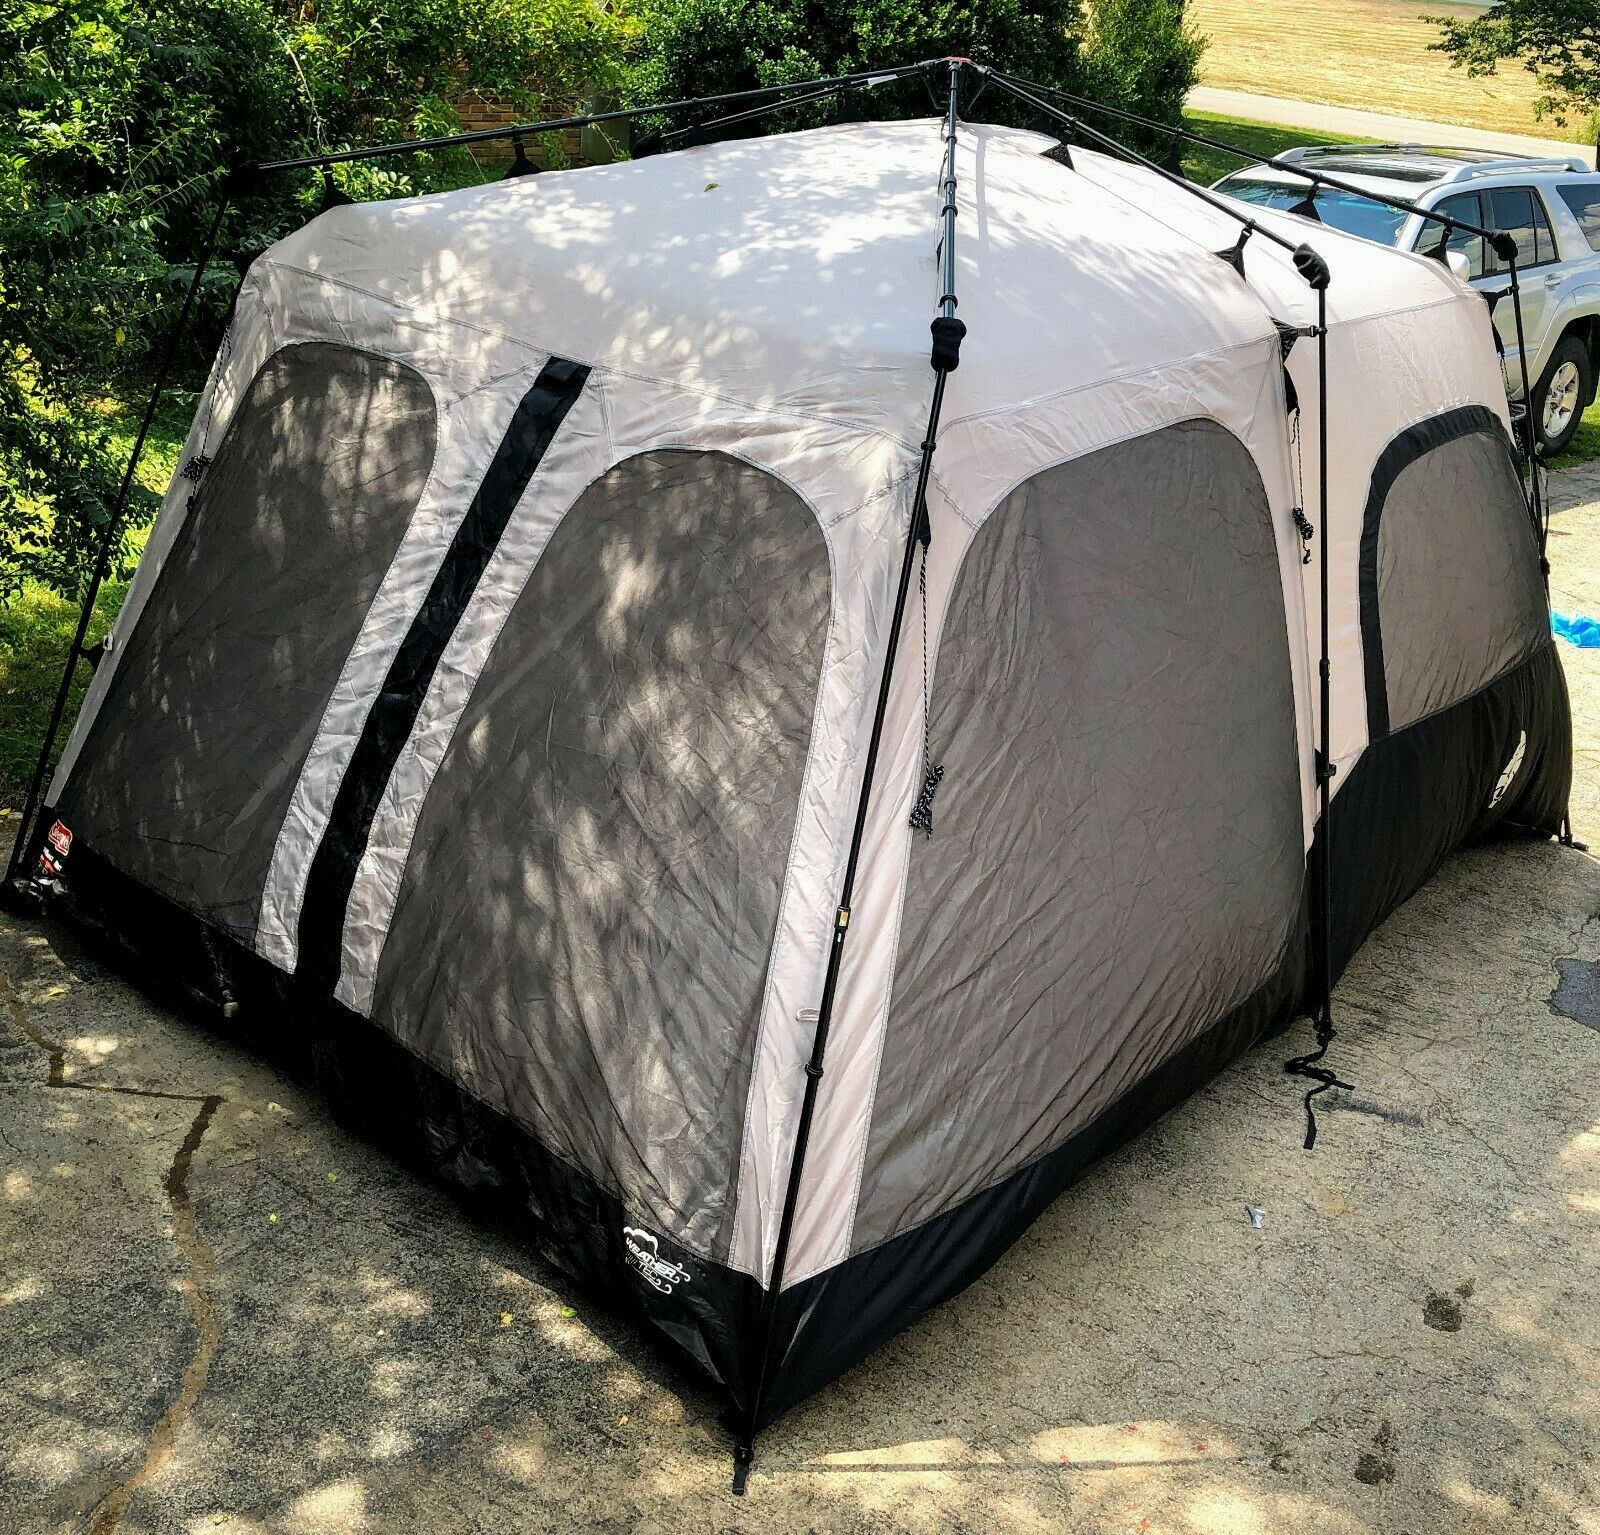 Coleuomo 2000023236 8Person Instant Family Tent WeatherTec 14x10x6.5 feet